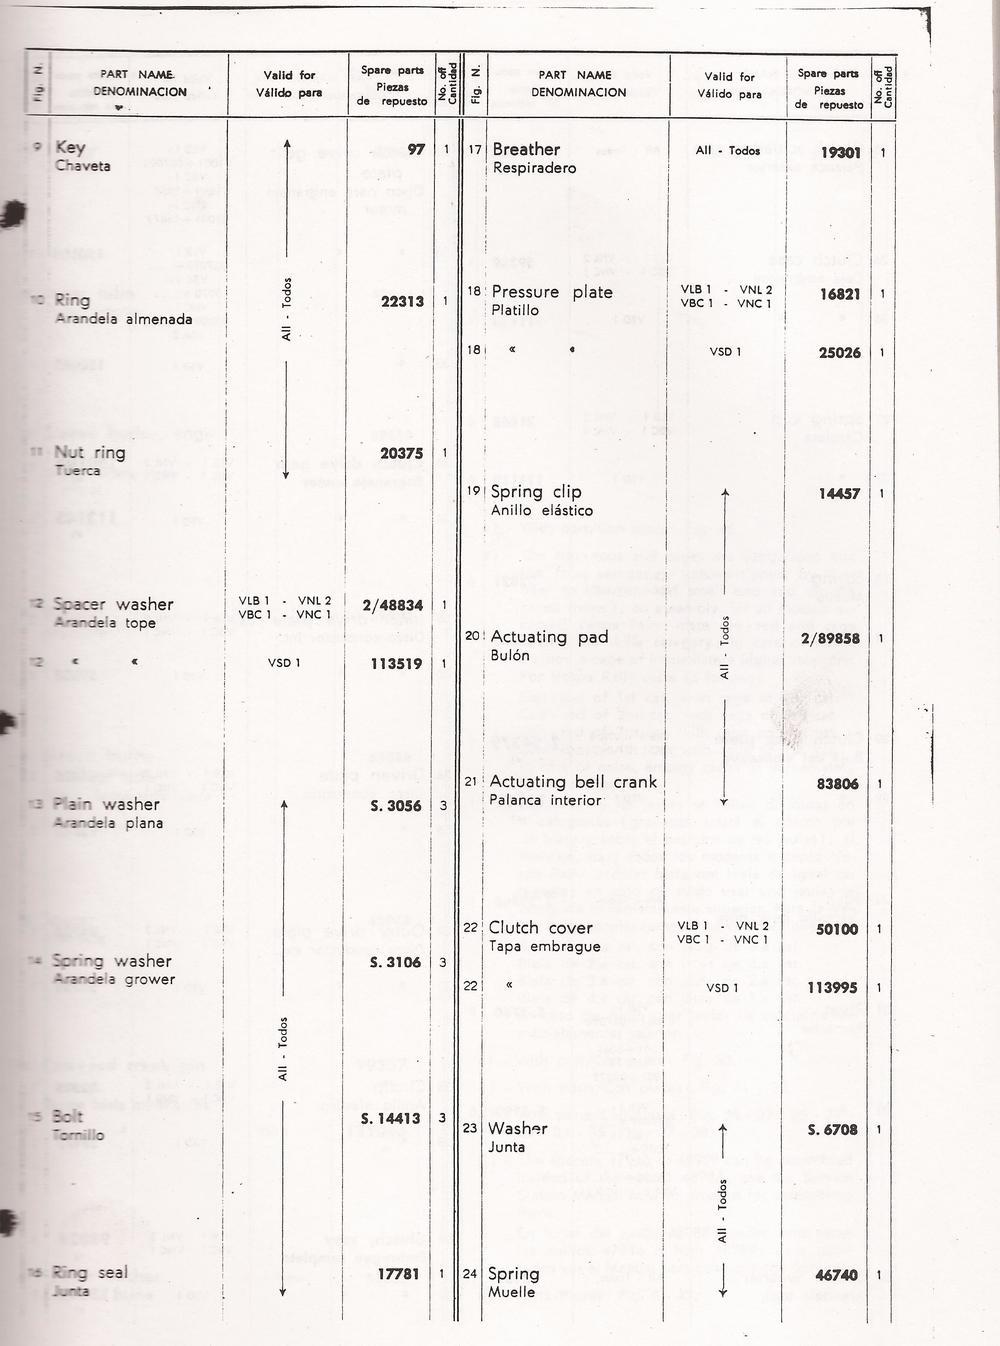 02-25-2013 vespa manaul 7.jpg